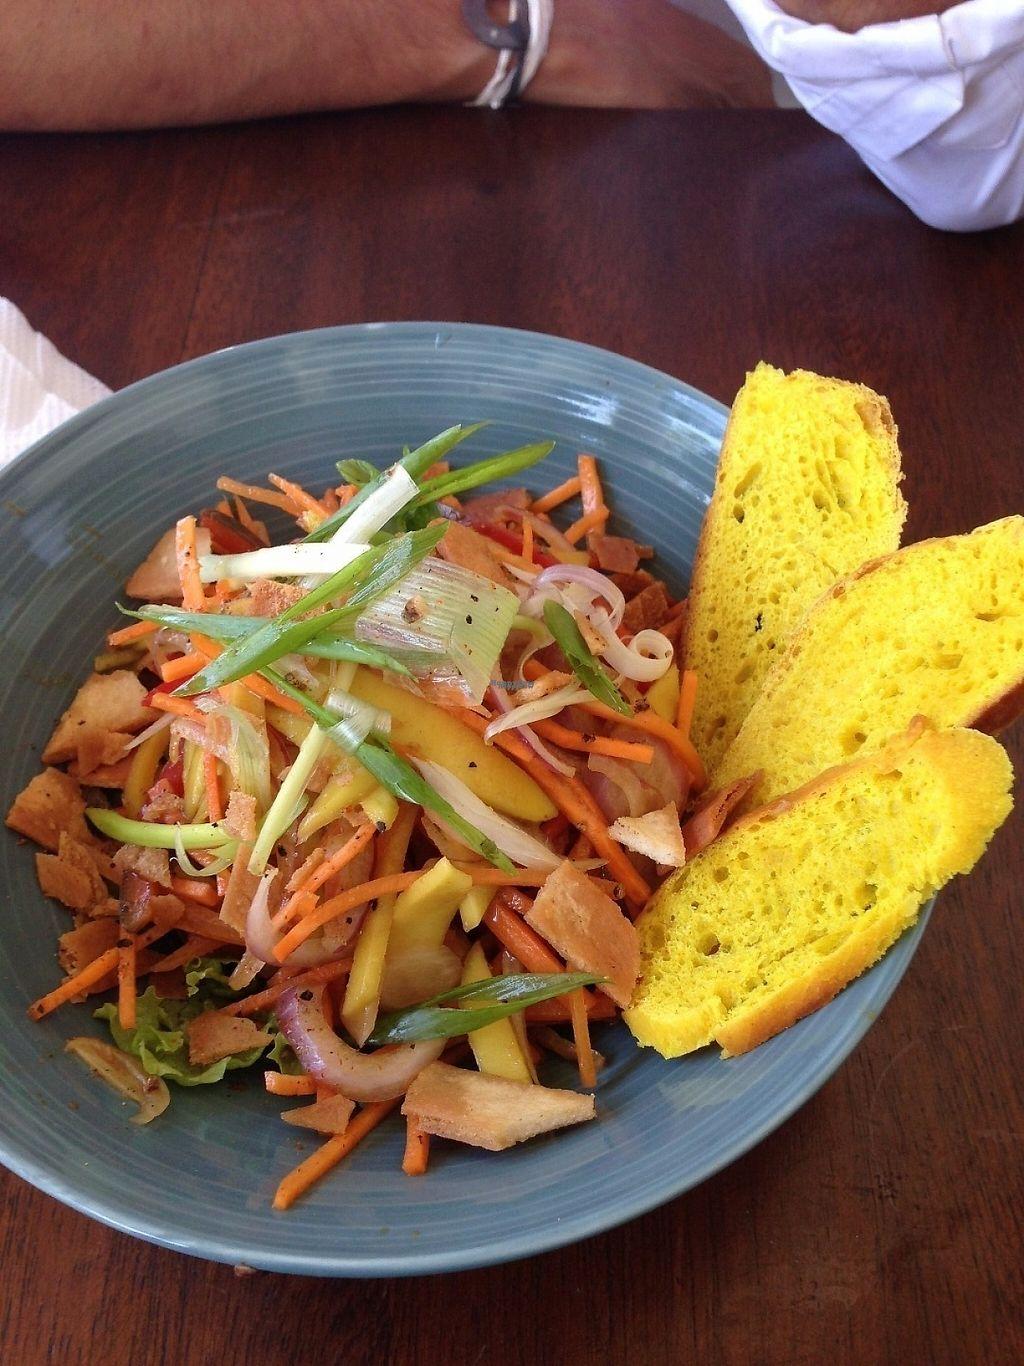 "Photo of Cafe Kumbuk Good Market  by <a href=""/members/profile/CatDouglas"">CatDouglas</a> <br/>Thai papaya salad <br/> February 28, 2017  - <a href='/contact/abuse/image/86812/231169'>Report</a>"